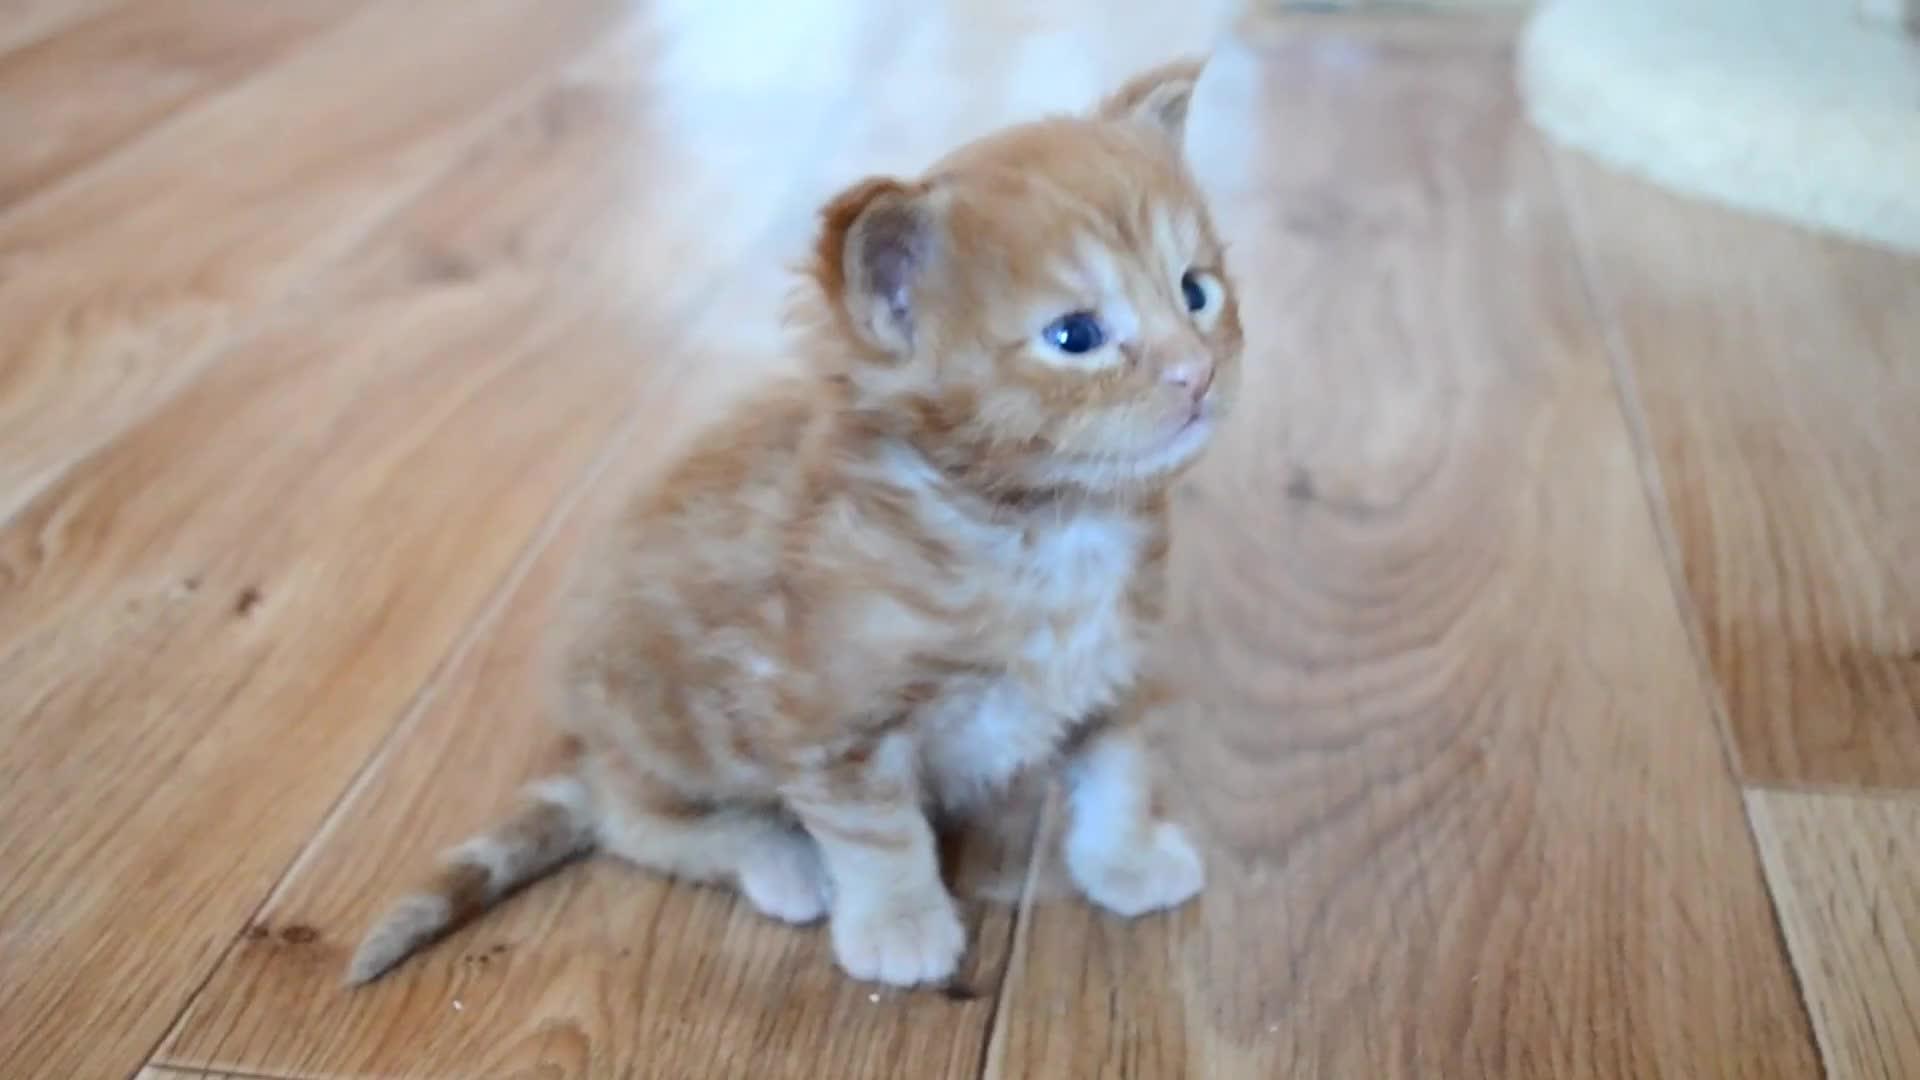 Cute, kitty, Cute, little Maine Coon kitten GIFs